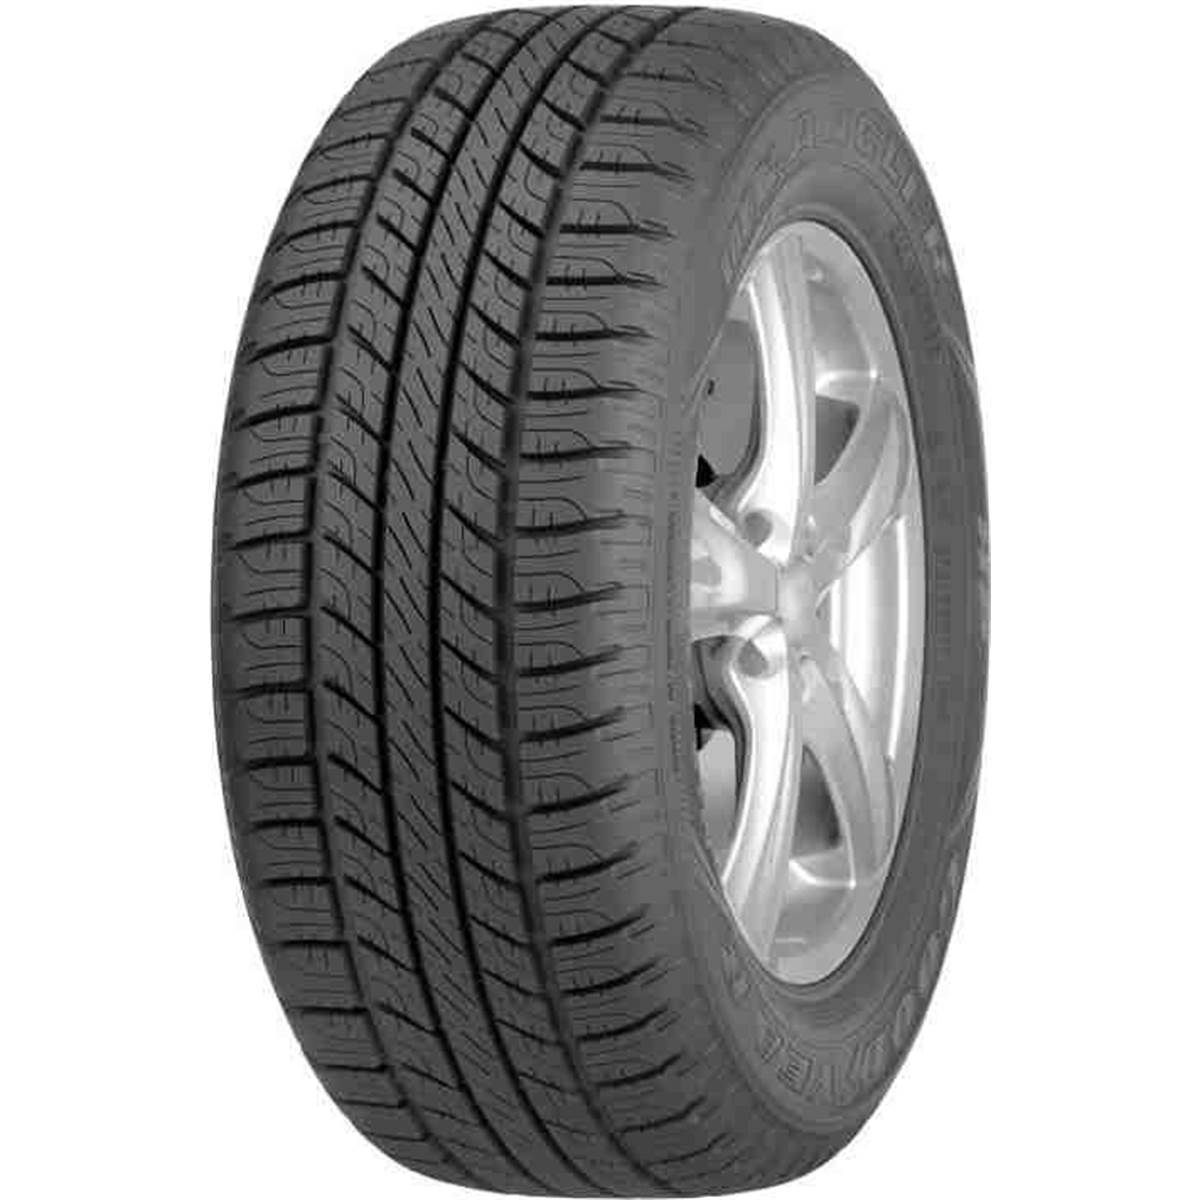 Goodyear Wrangler HP All Weather pneu